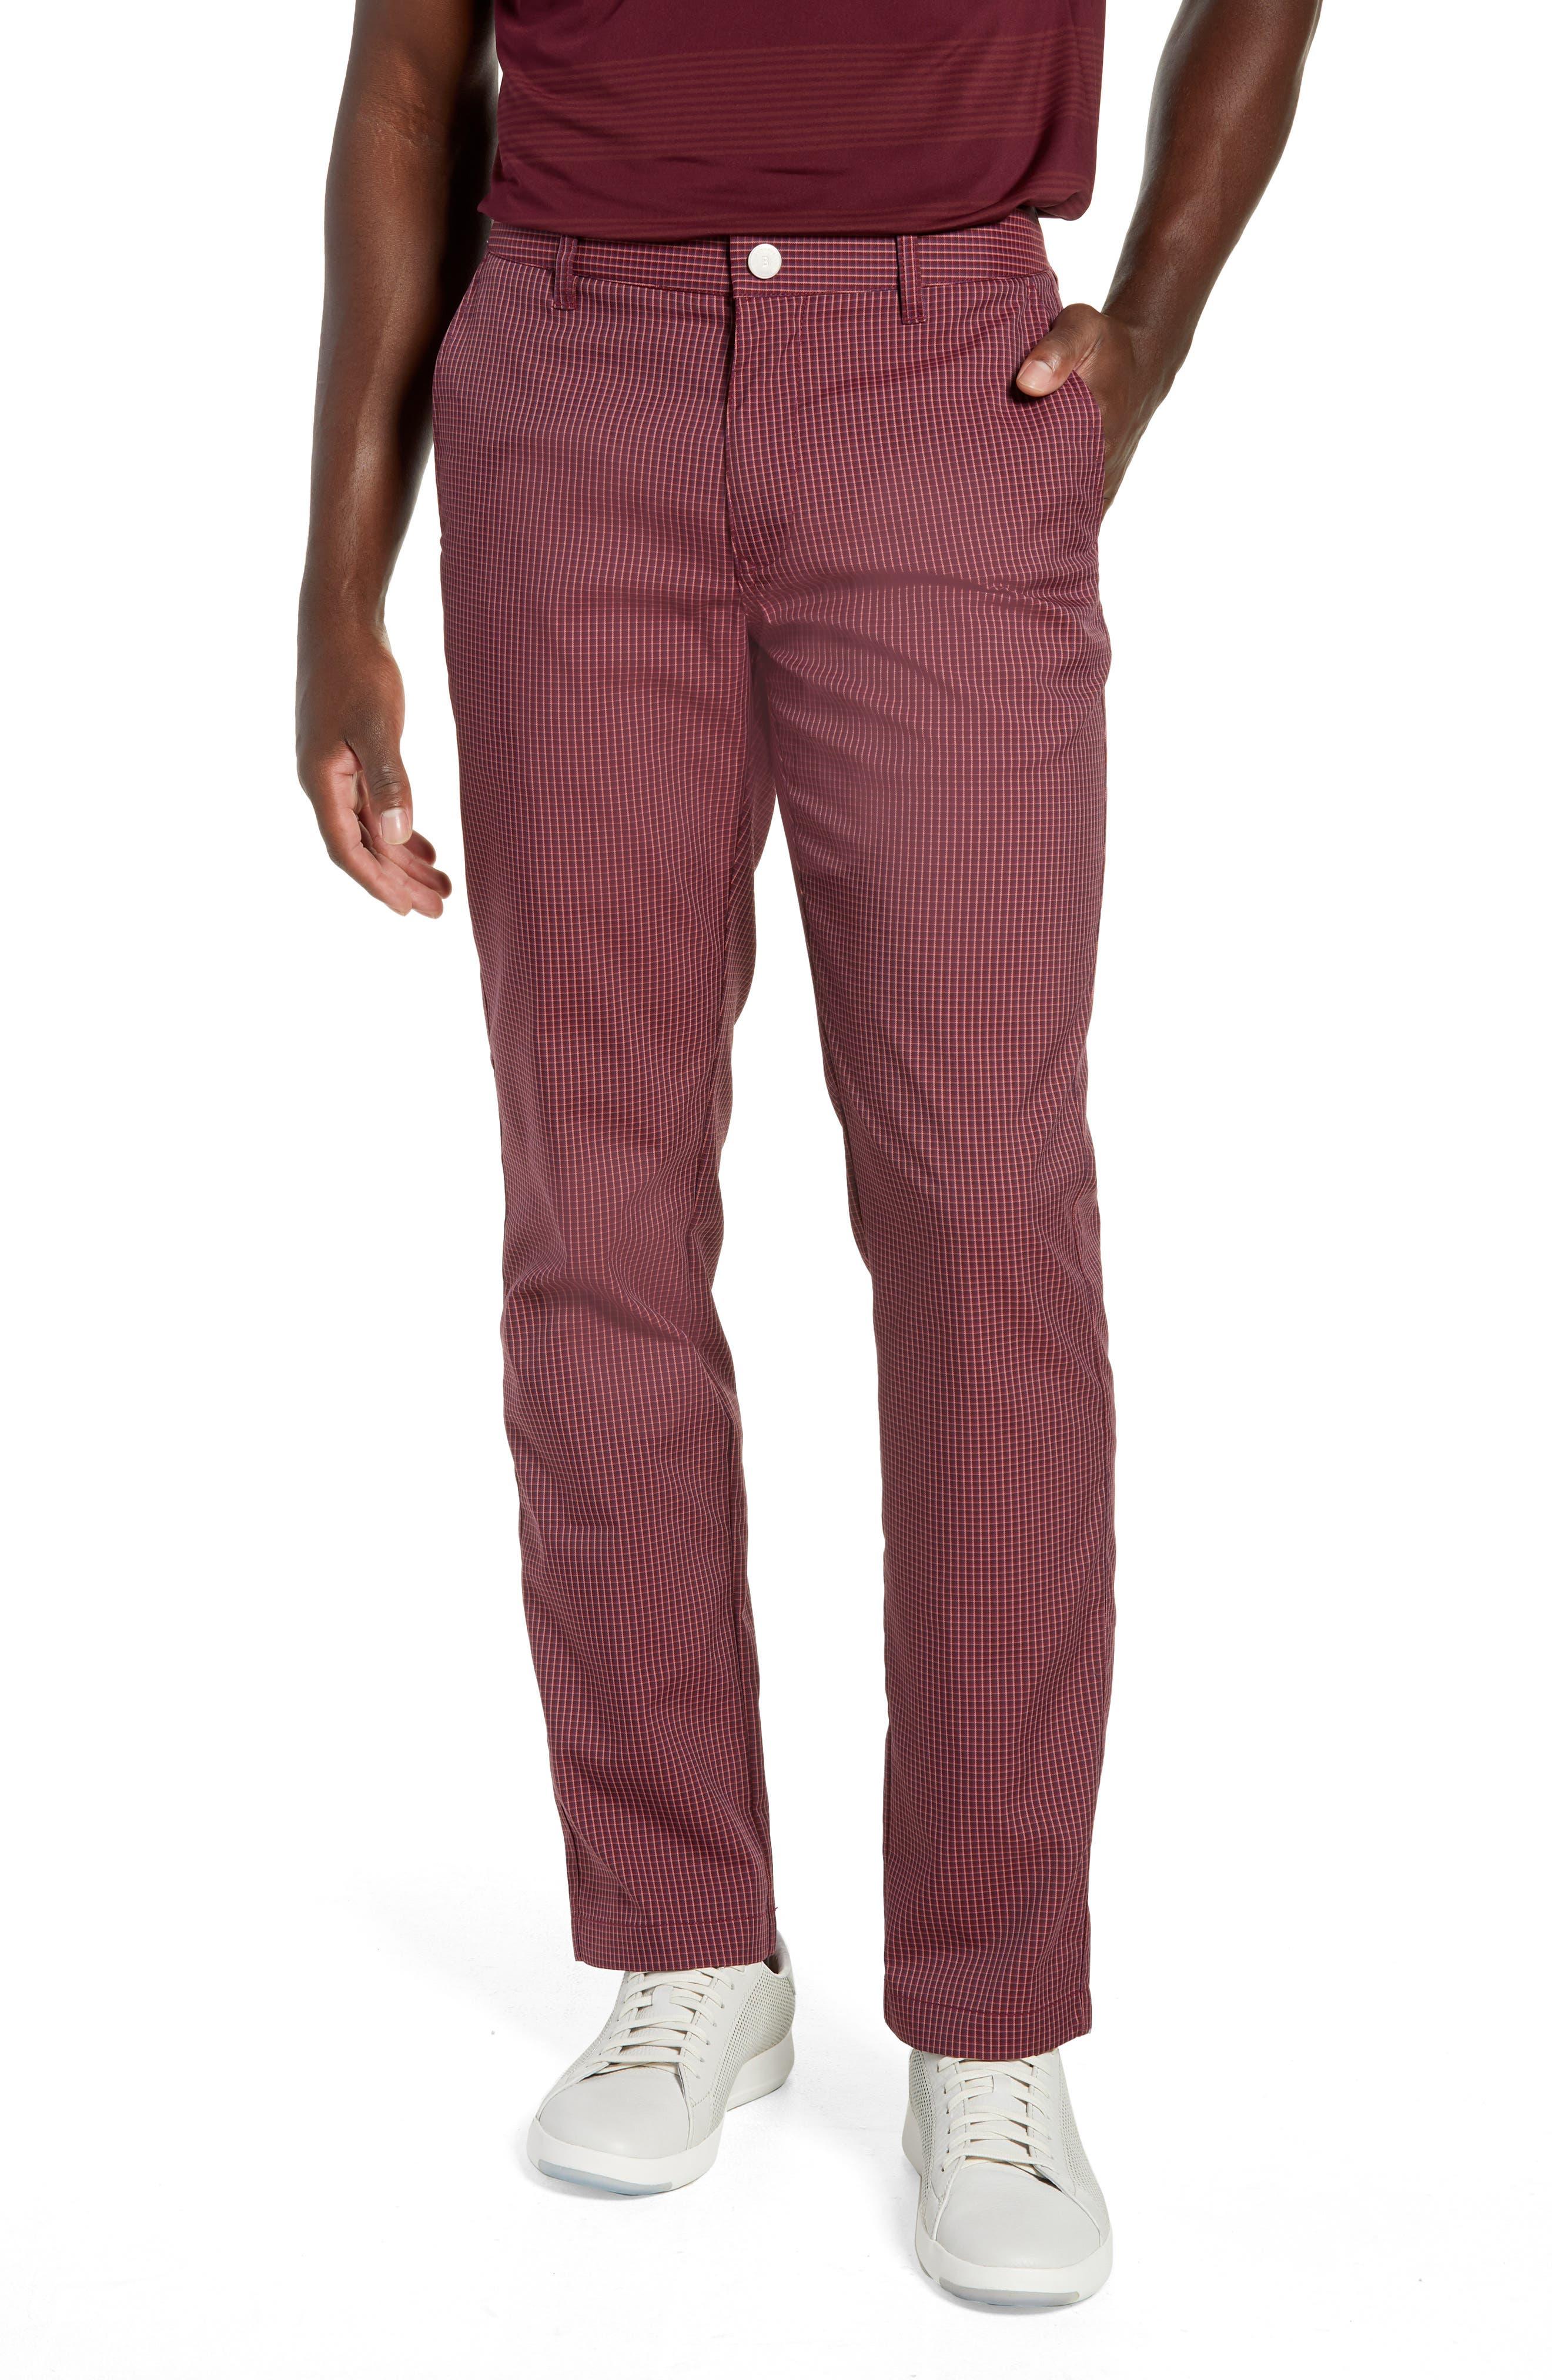 Highland Slim Fit Golf Pants,                             Main thumbnail 1, color,                             RED PLAID